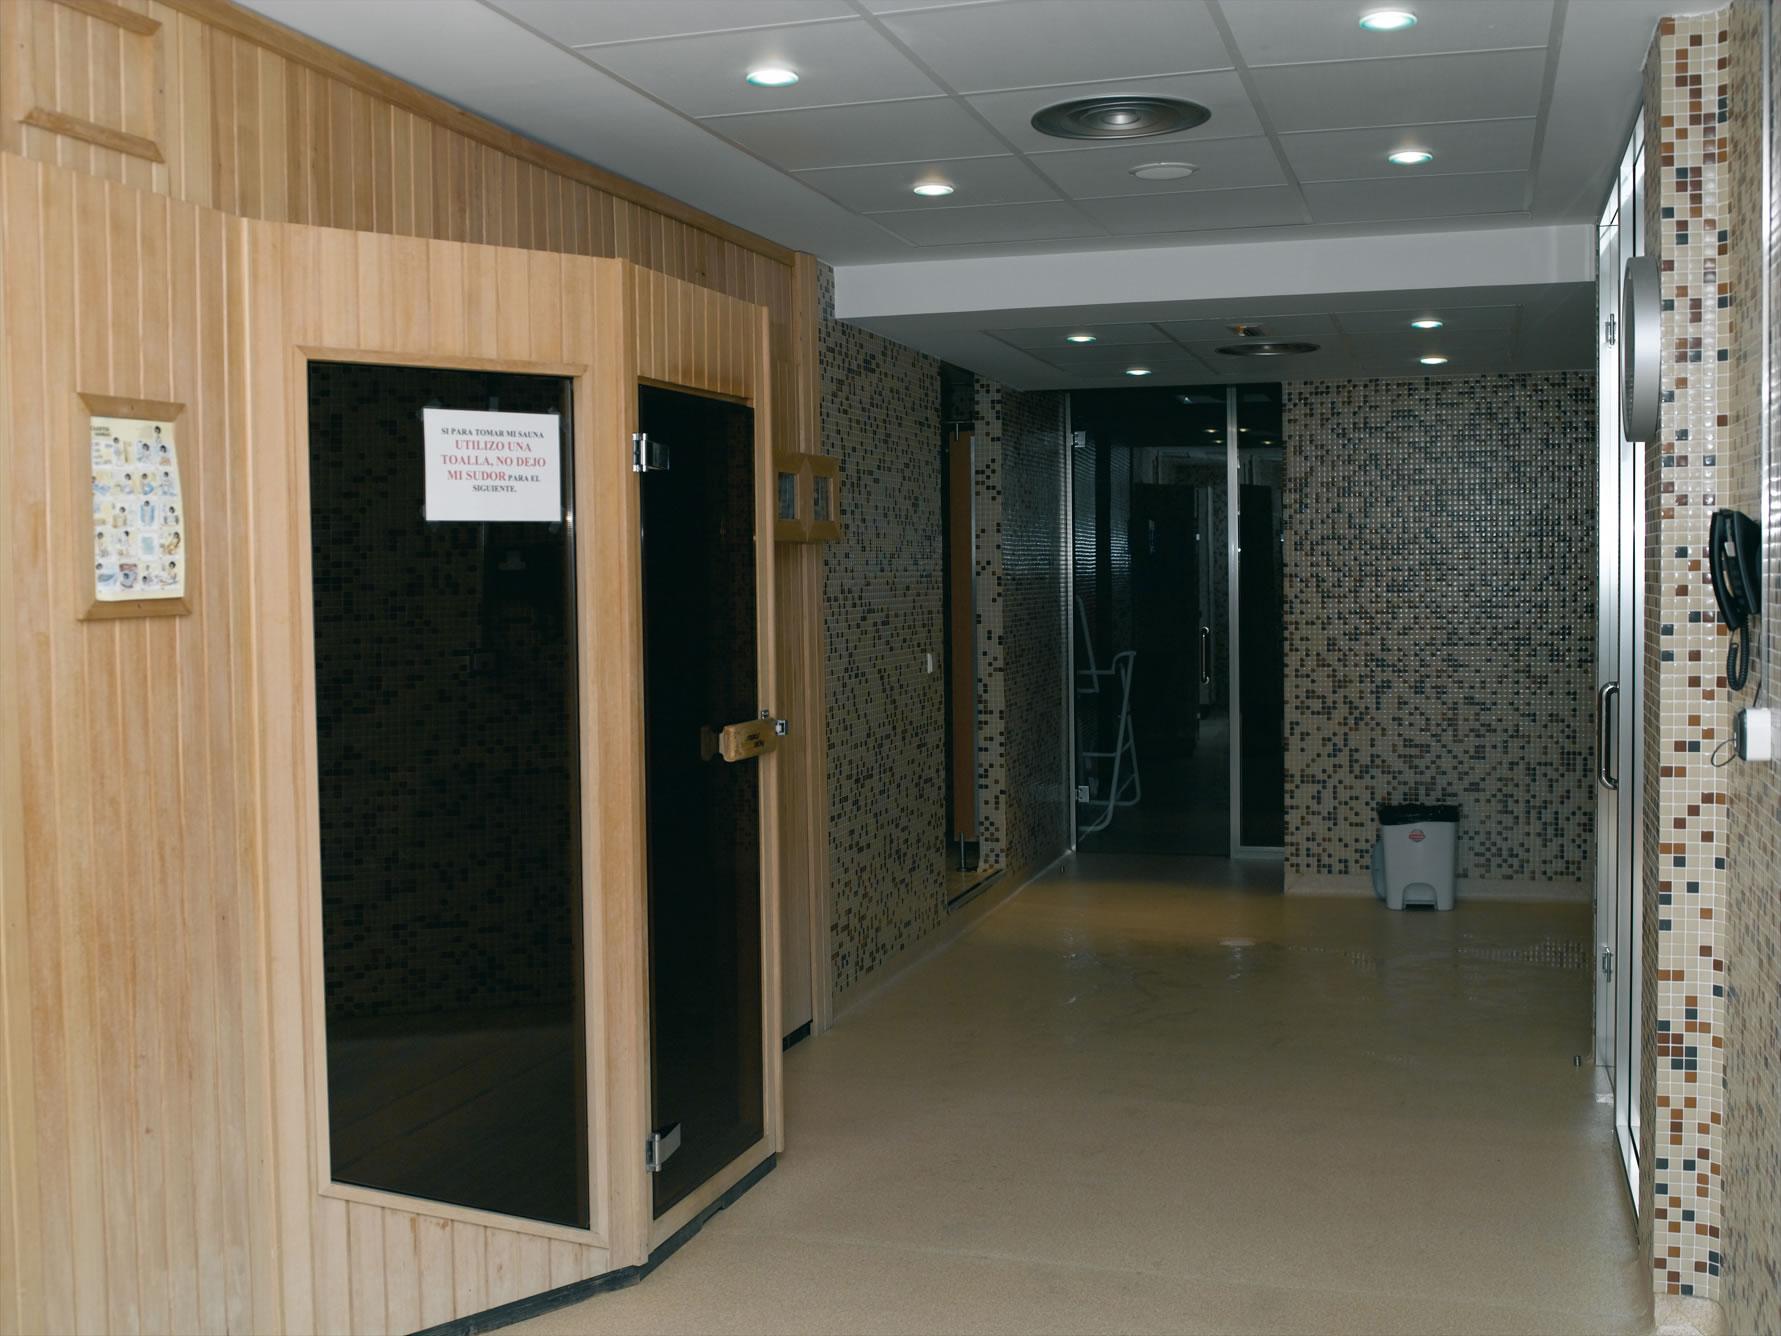 Jacuzzi O Baño Turco:Sauna seca Sauna húmeda o baño turco Frigidario Duchas de chorros